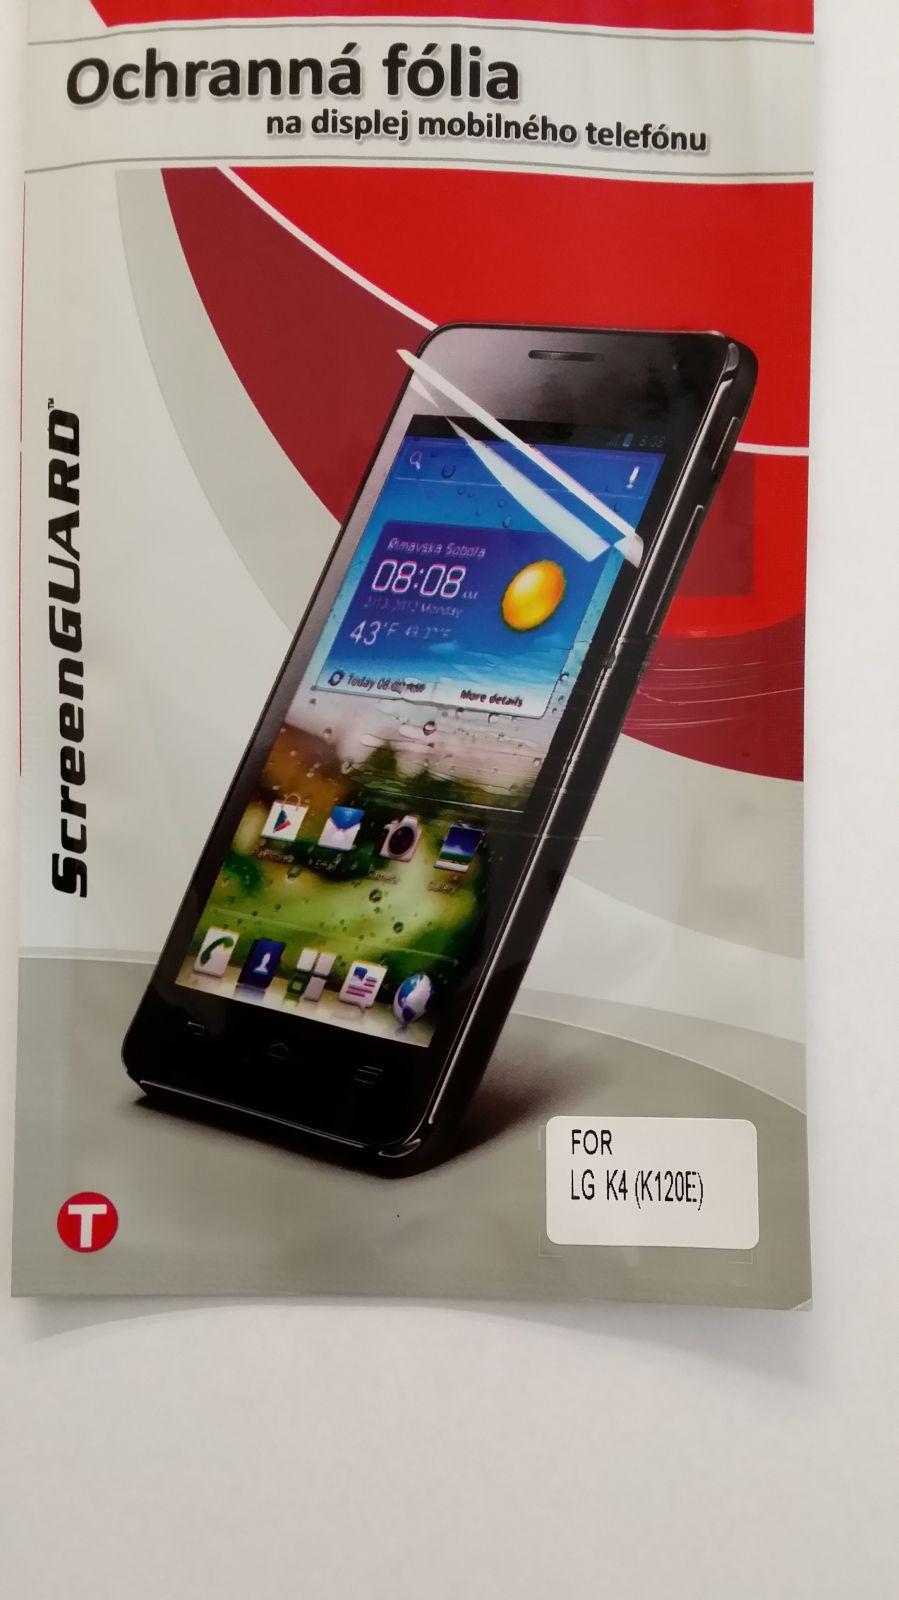 Ochranná folie Mobilnet LG K4/K120